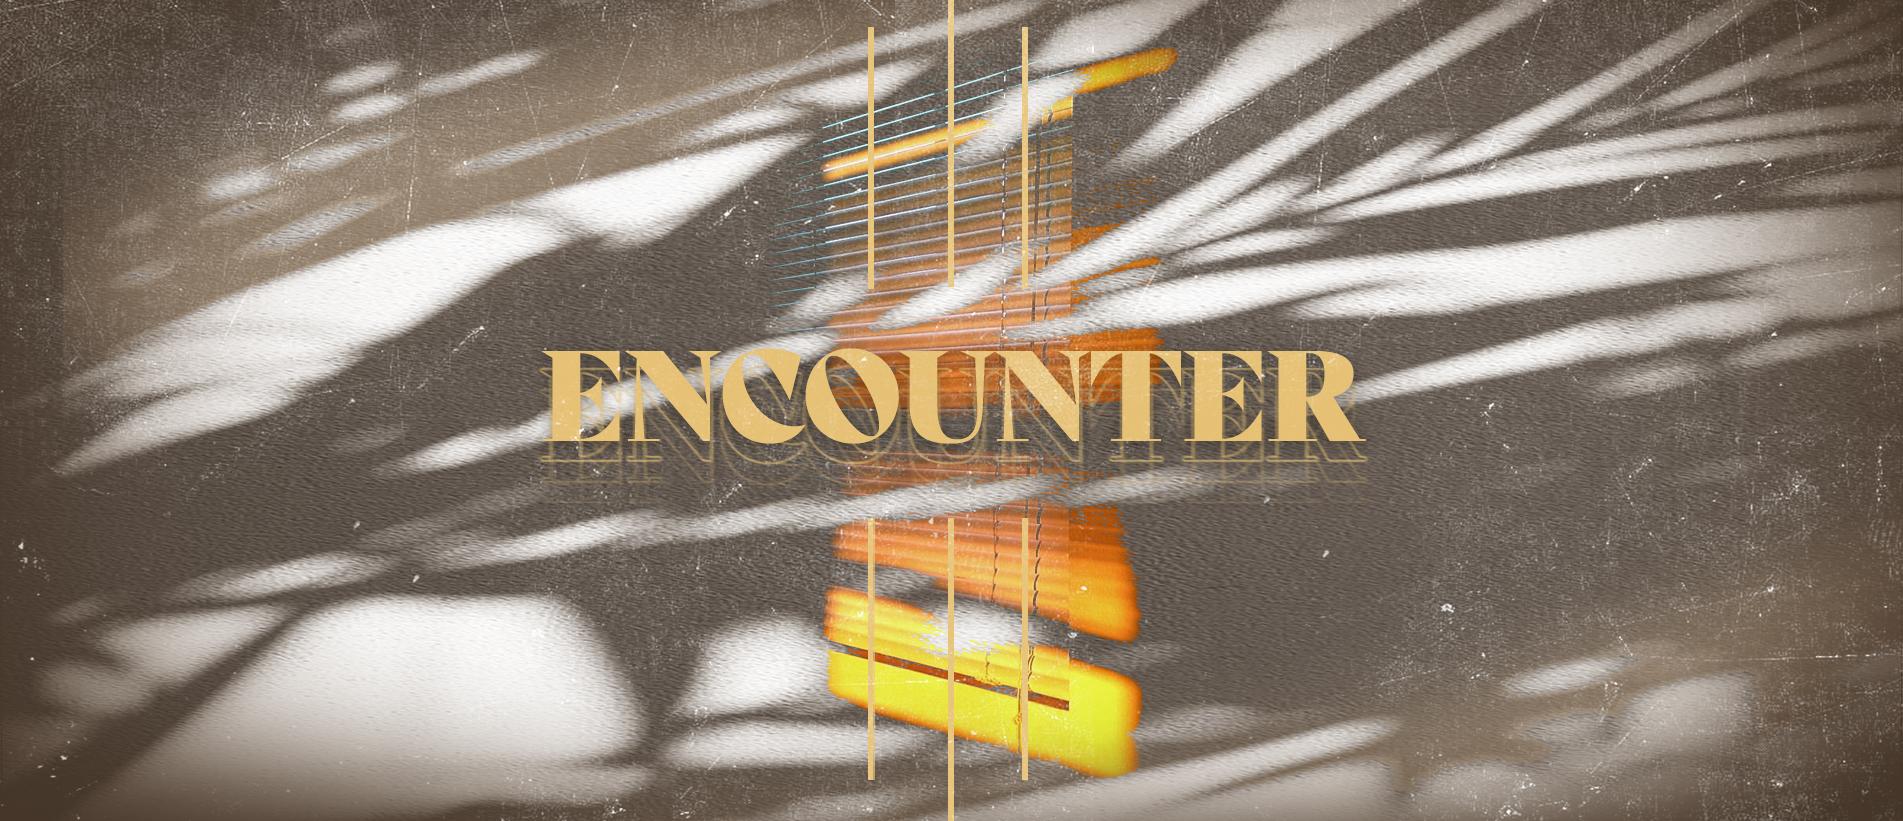 Summer Encounter 21-22 августа